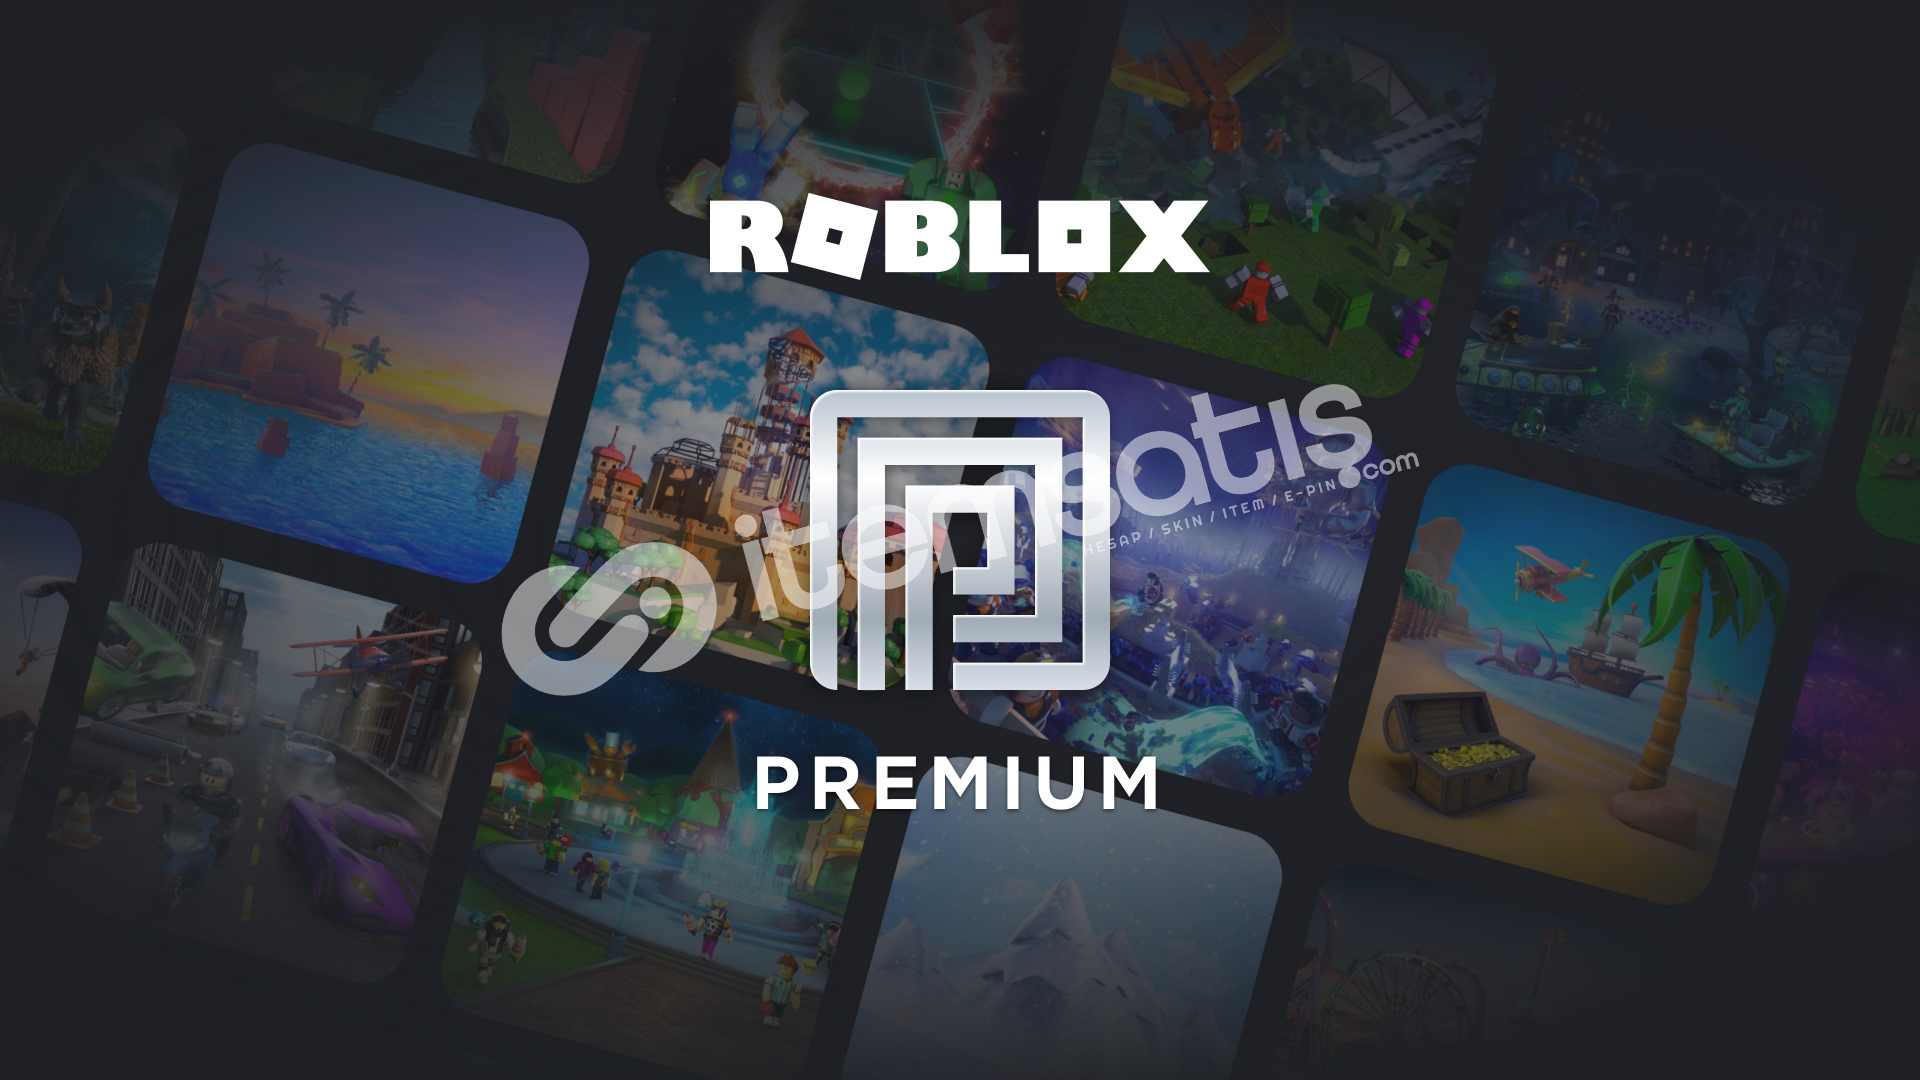 ROBLOX 800 Robux + 80 Robux Hediyemizdir